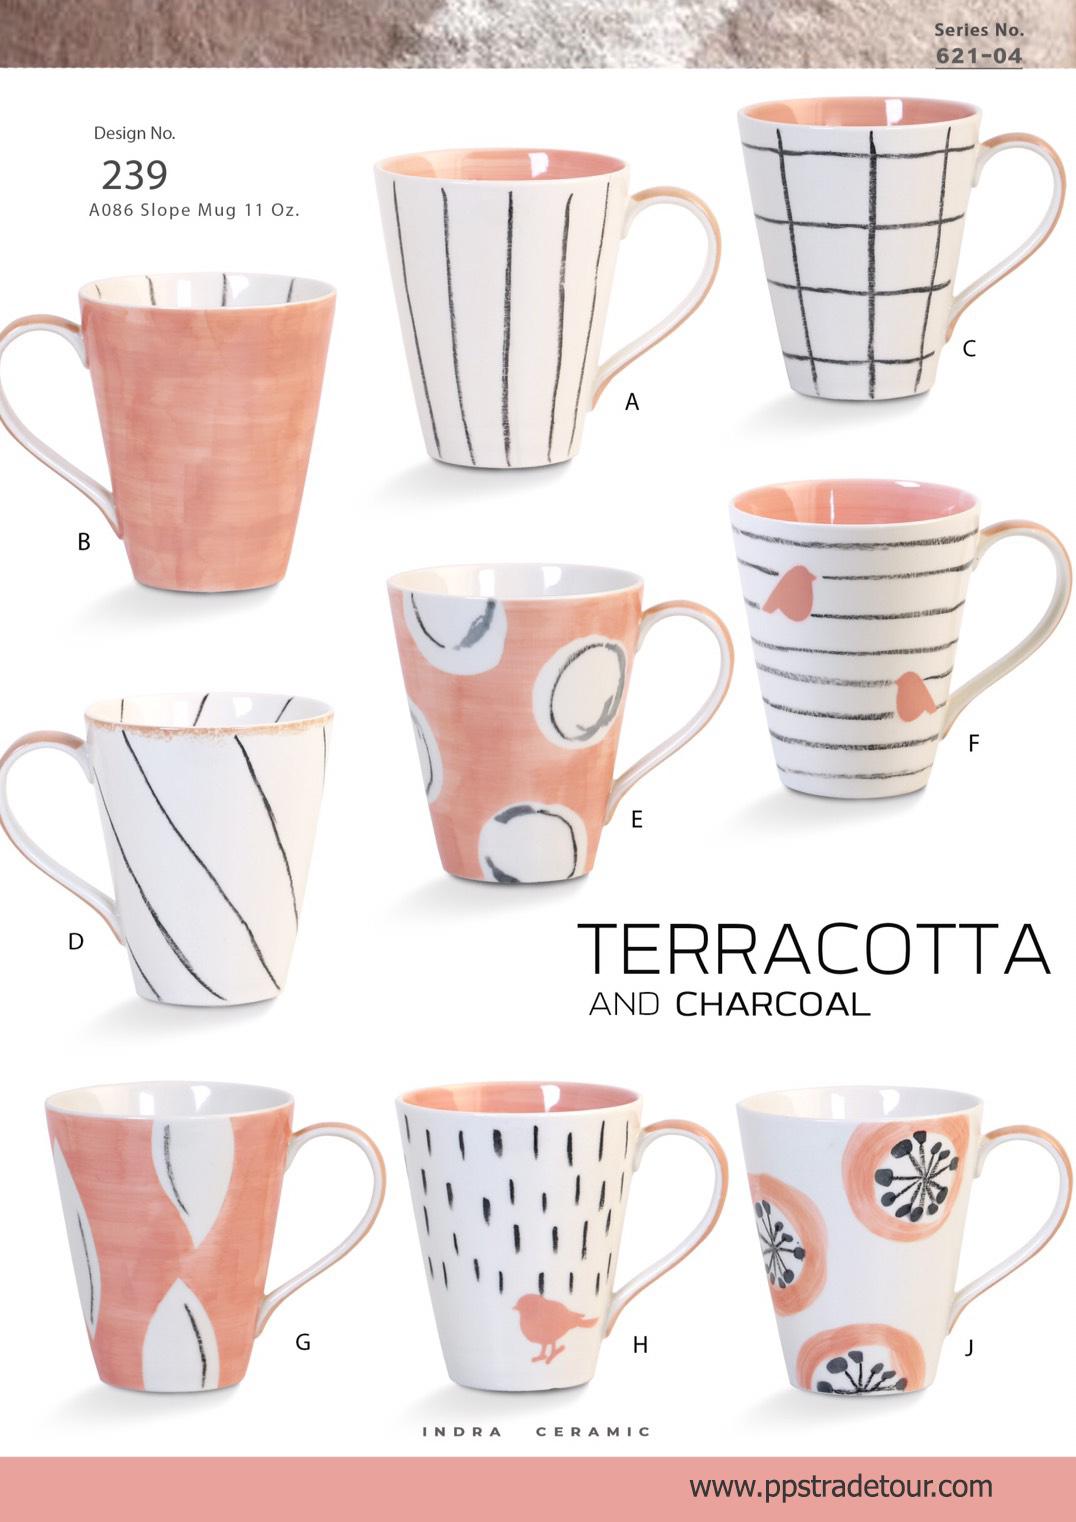 Terracotta and charcoal-Ceramic Mug 11 Oz.